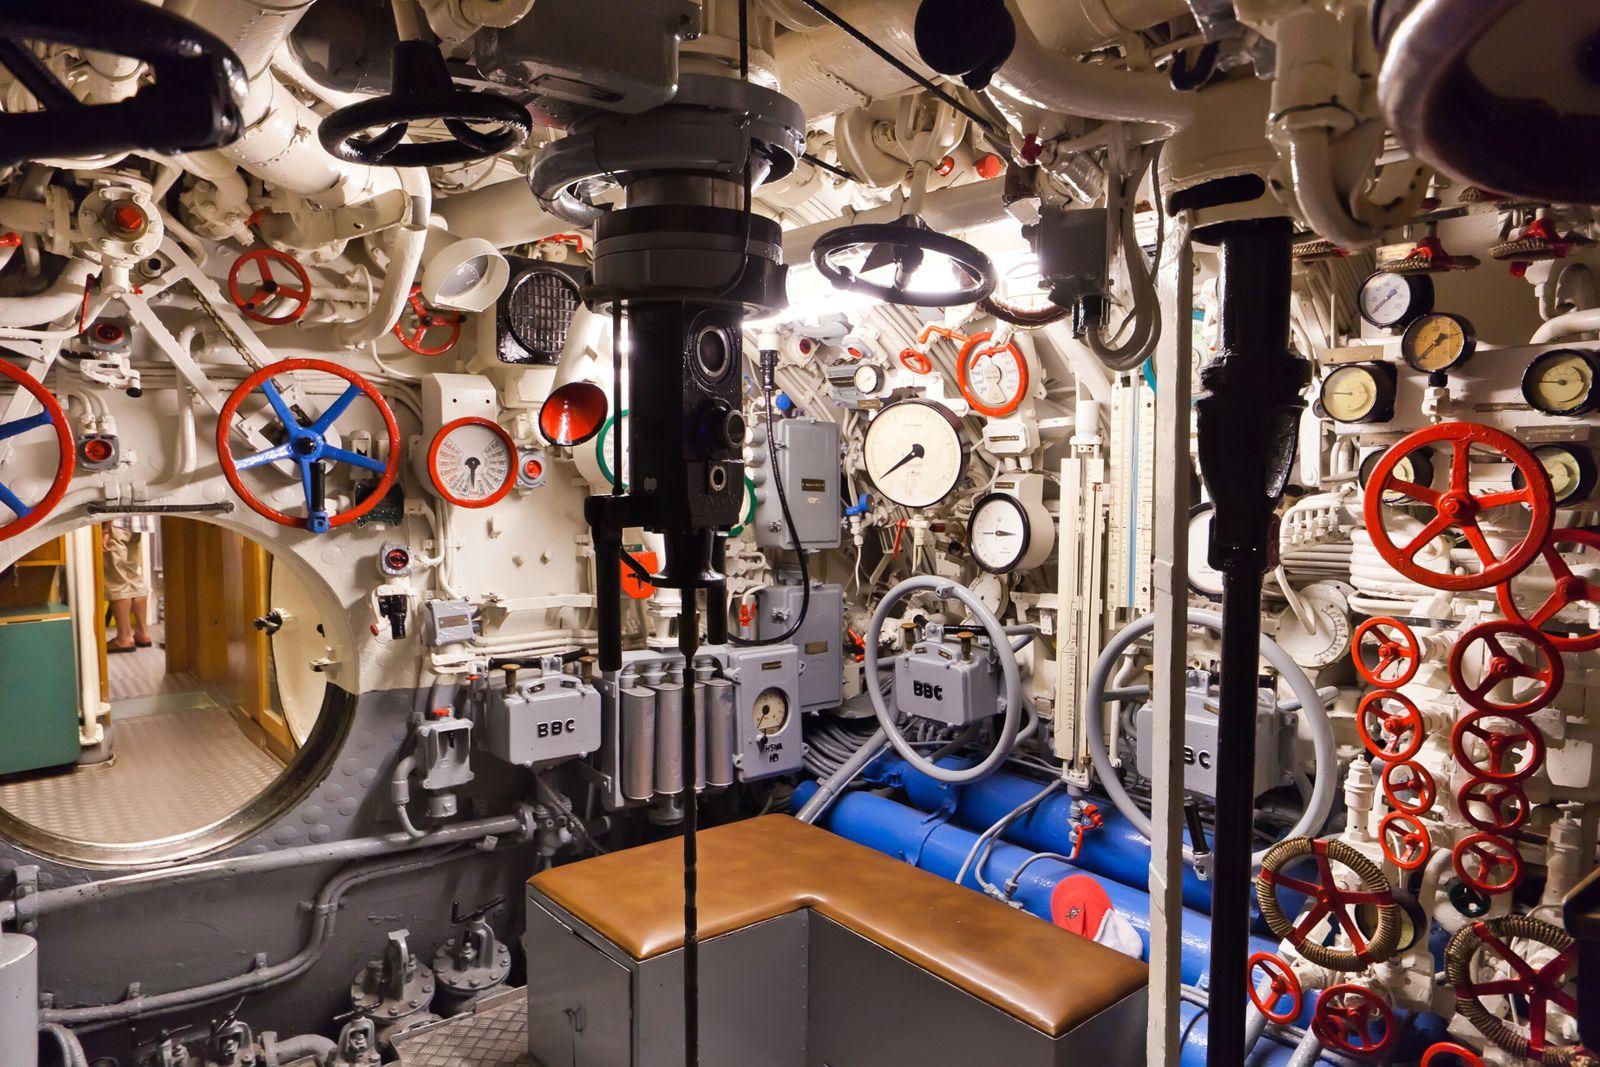 German world war 2 submarine type VIIC/41 - command center - ultra wide angle photo (furzyk73)